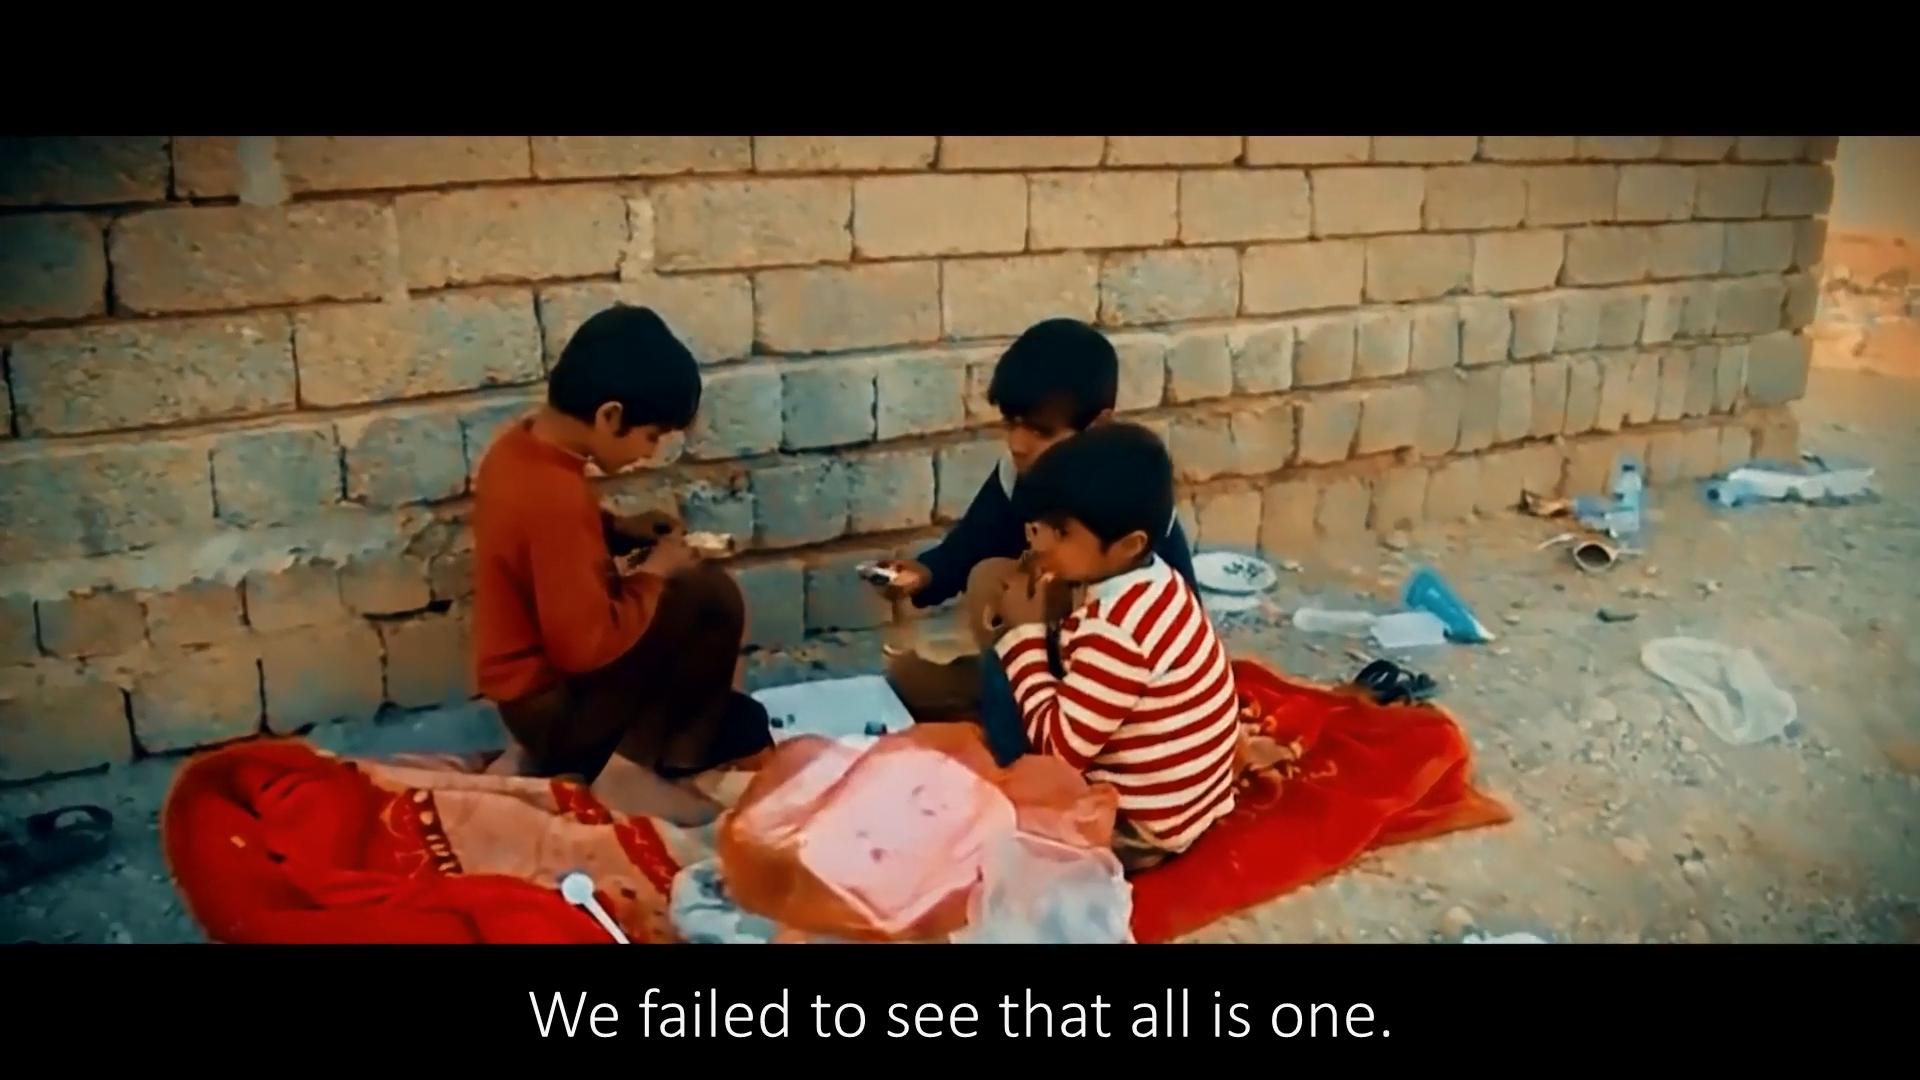 Letzte Instanz ft. Orphaned Land - Children [English Subtitles] 4